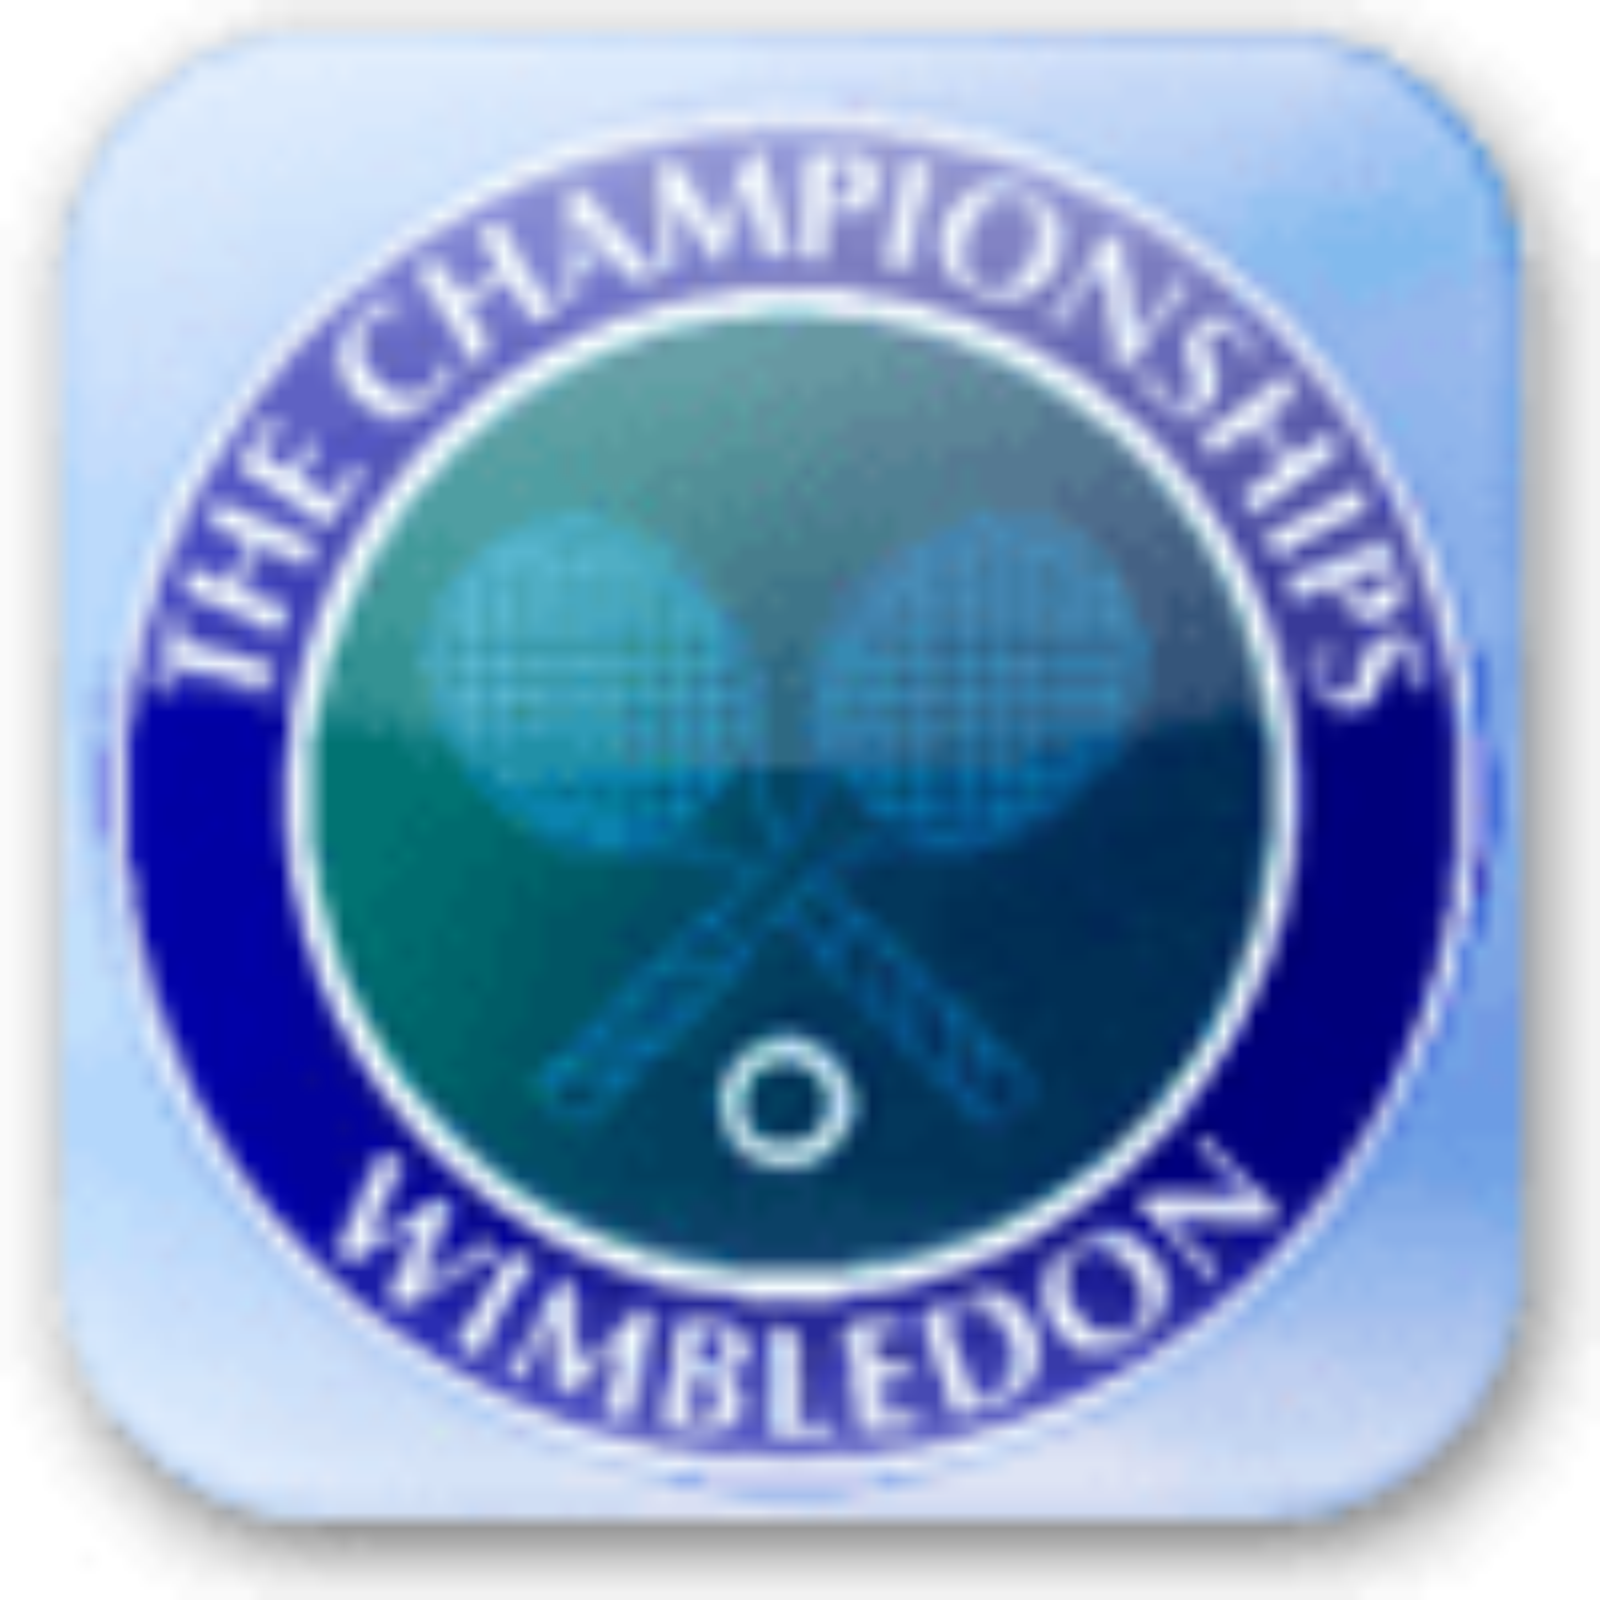 Tapeta Wimbledon Courts